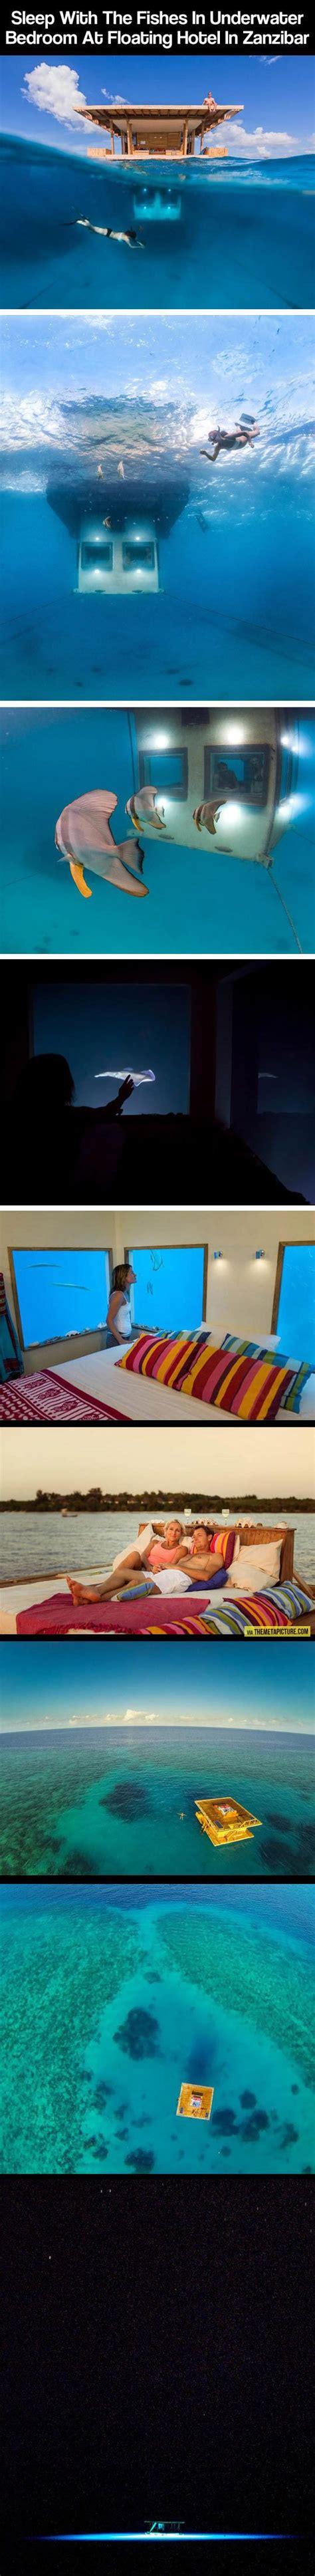 underwater bedrooms 25 best ideas about underwater bedroom on pinterest ocean themed rooms sea theme